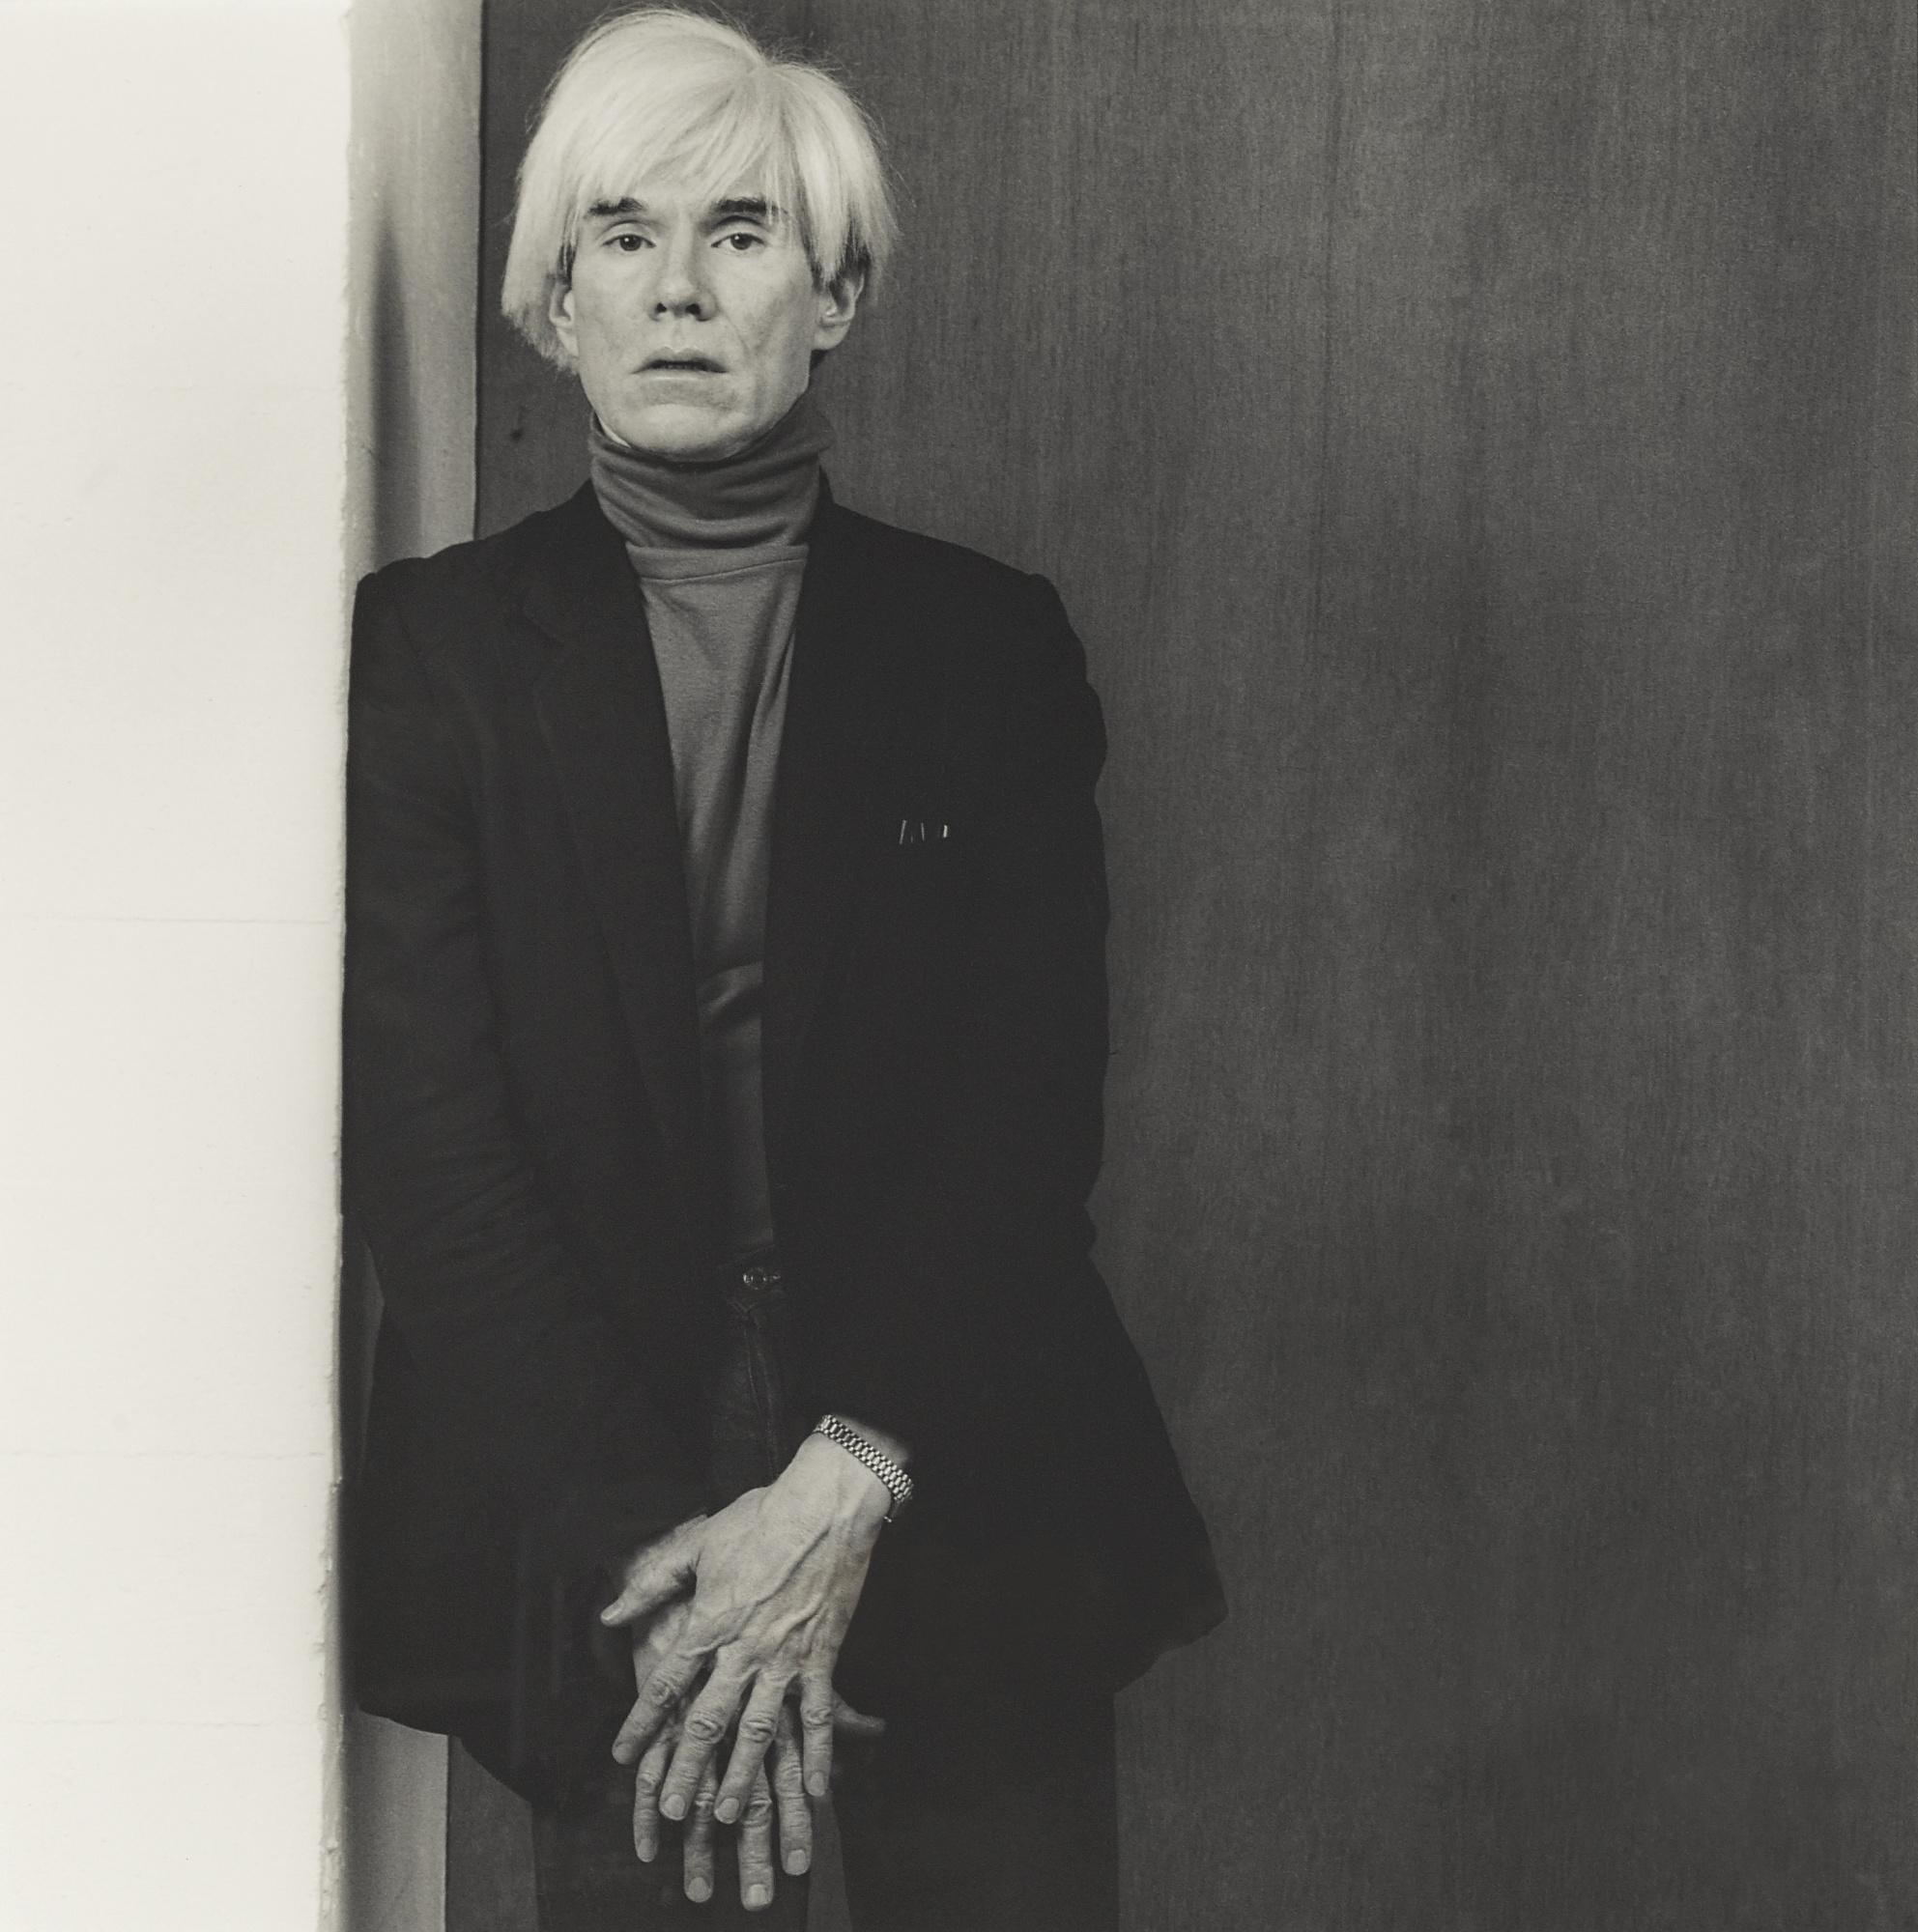 Robert Mapplethorpe-Andy Warhol-1983